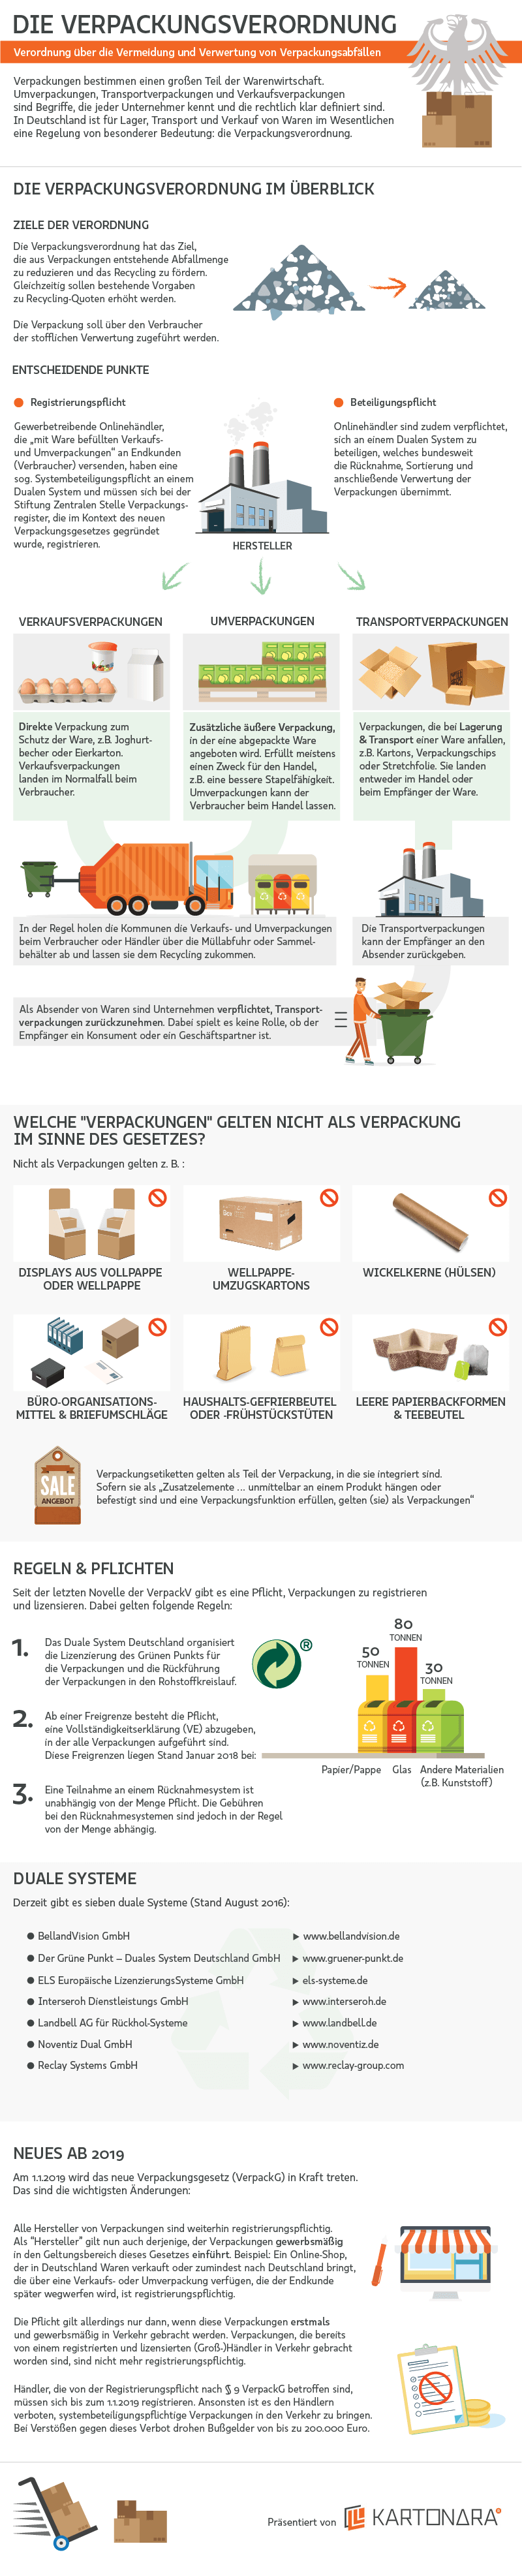 verpackungsverordnung-infografik